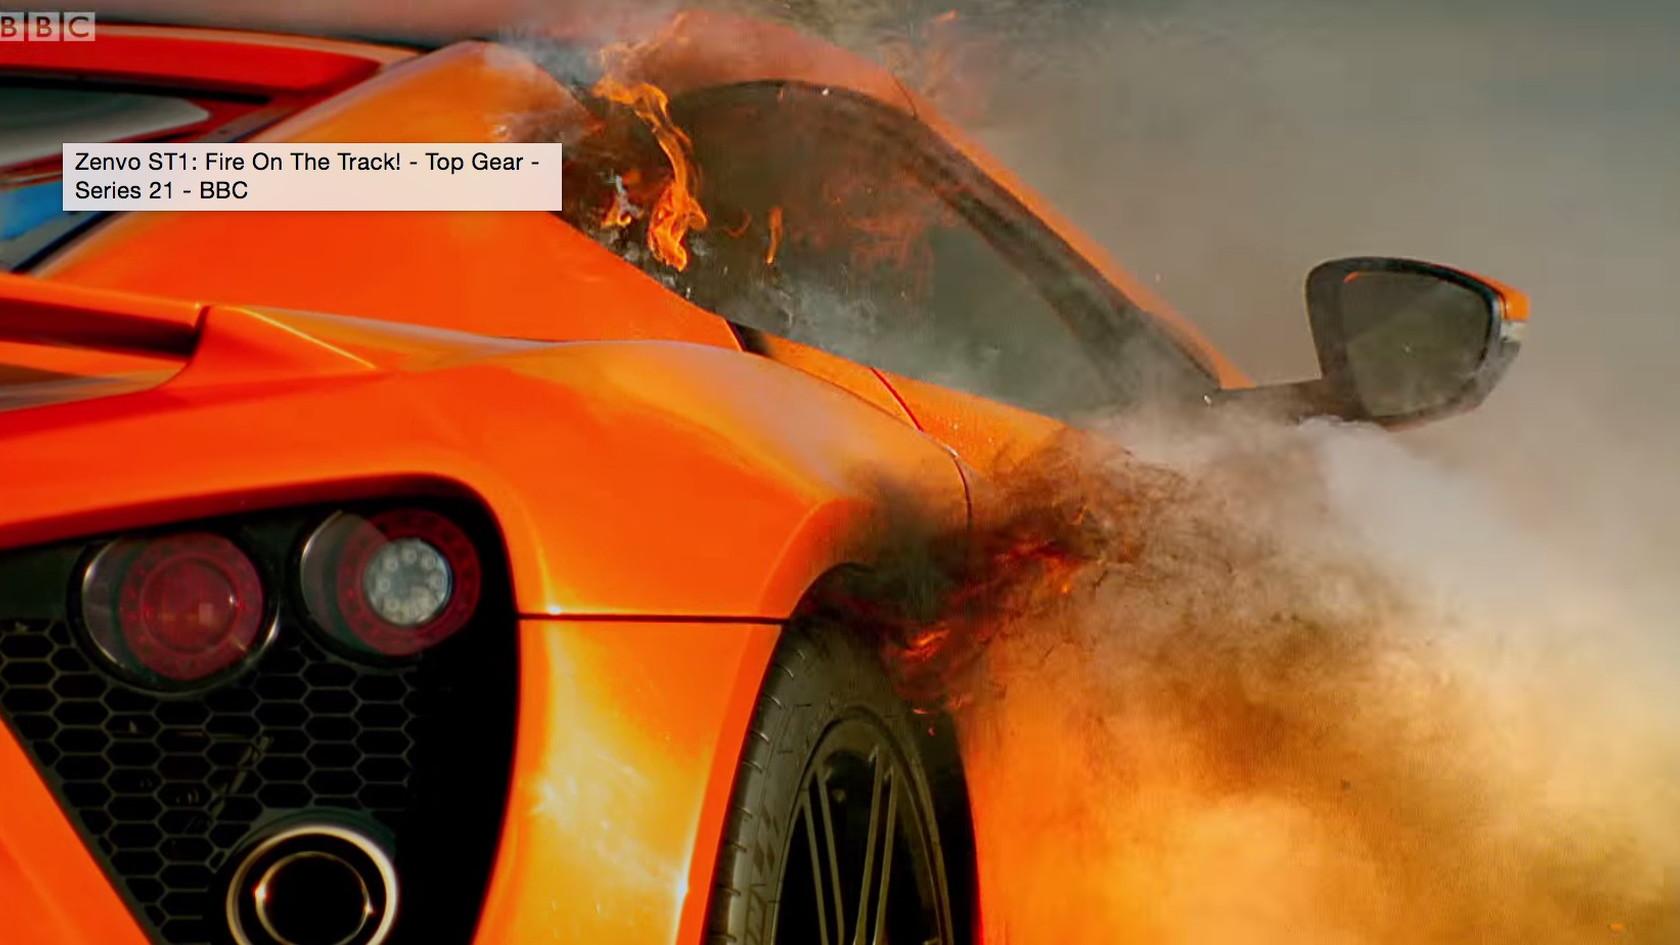 Zenvo ST1 catches fire on Top Gear